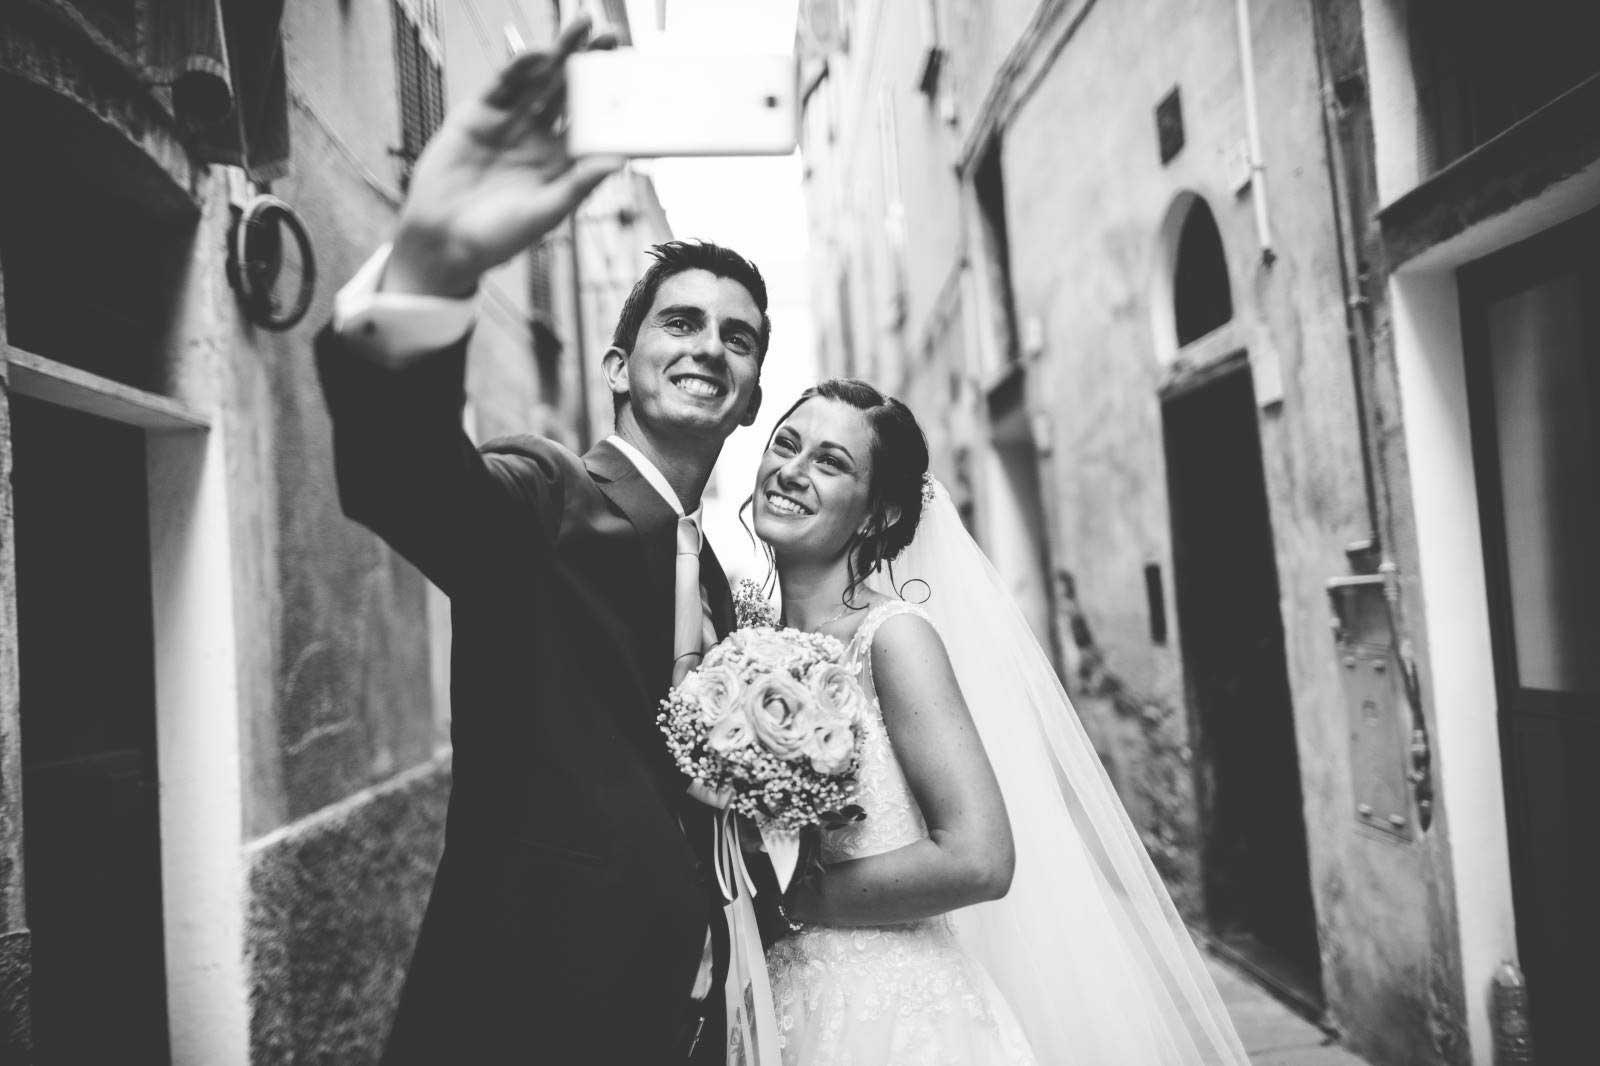 Giada_e_Luca_matrimonio_02270_5D4_2164